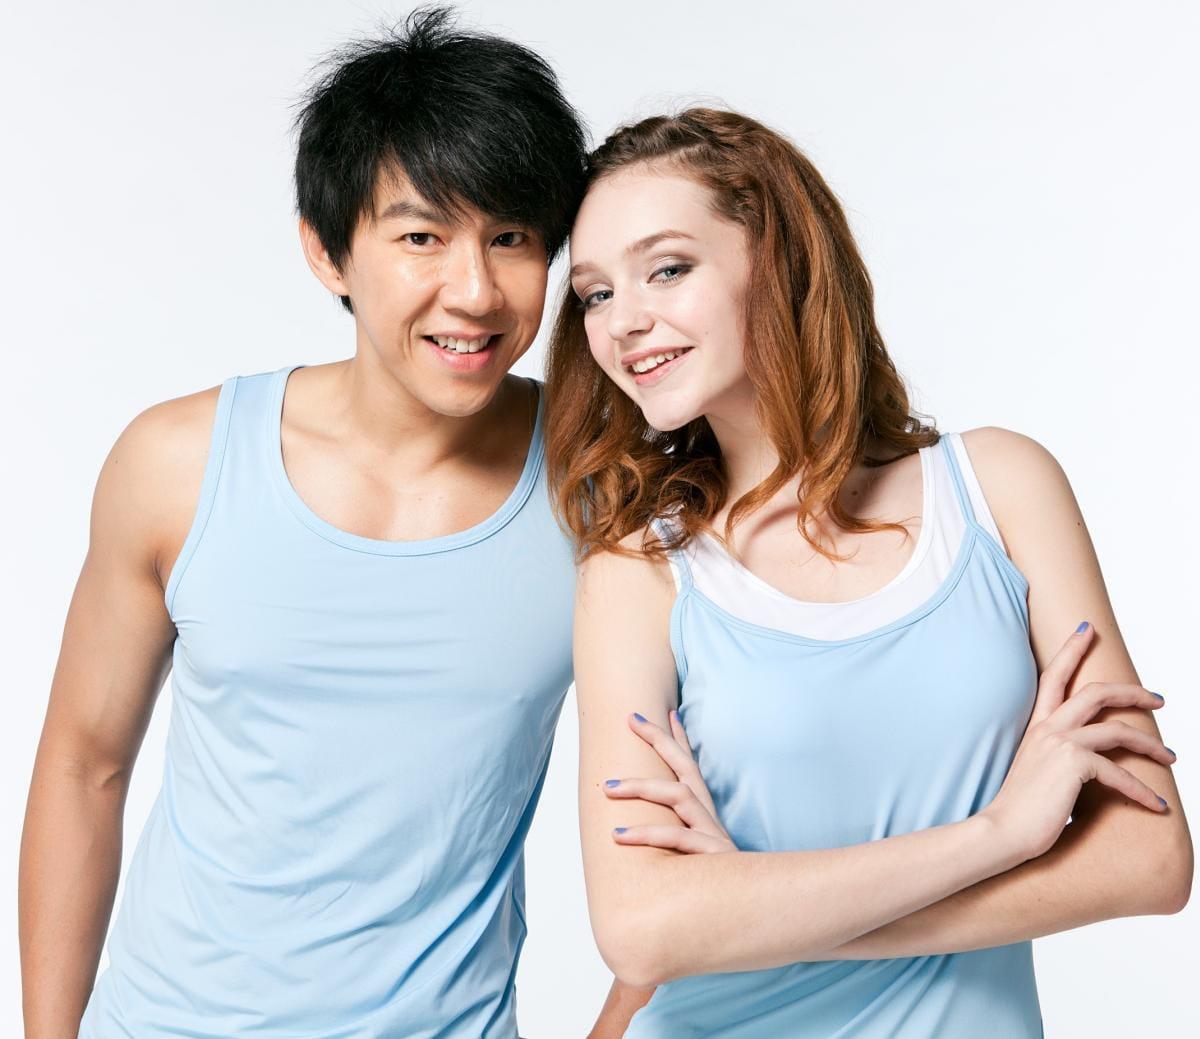 【BODYFEEL】体感服飾-夏季男款涼感抗UV坦克背心 0